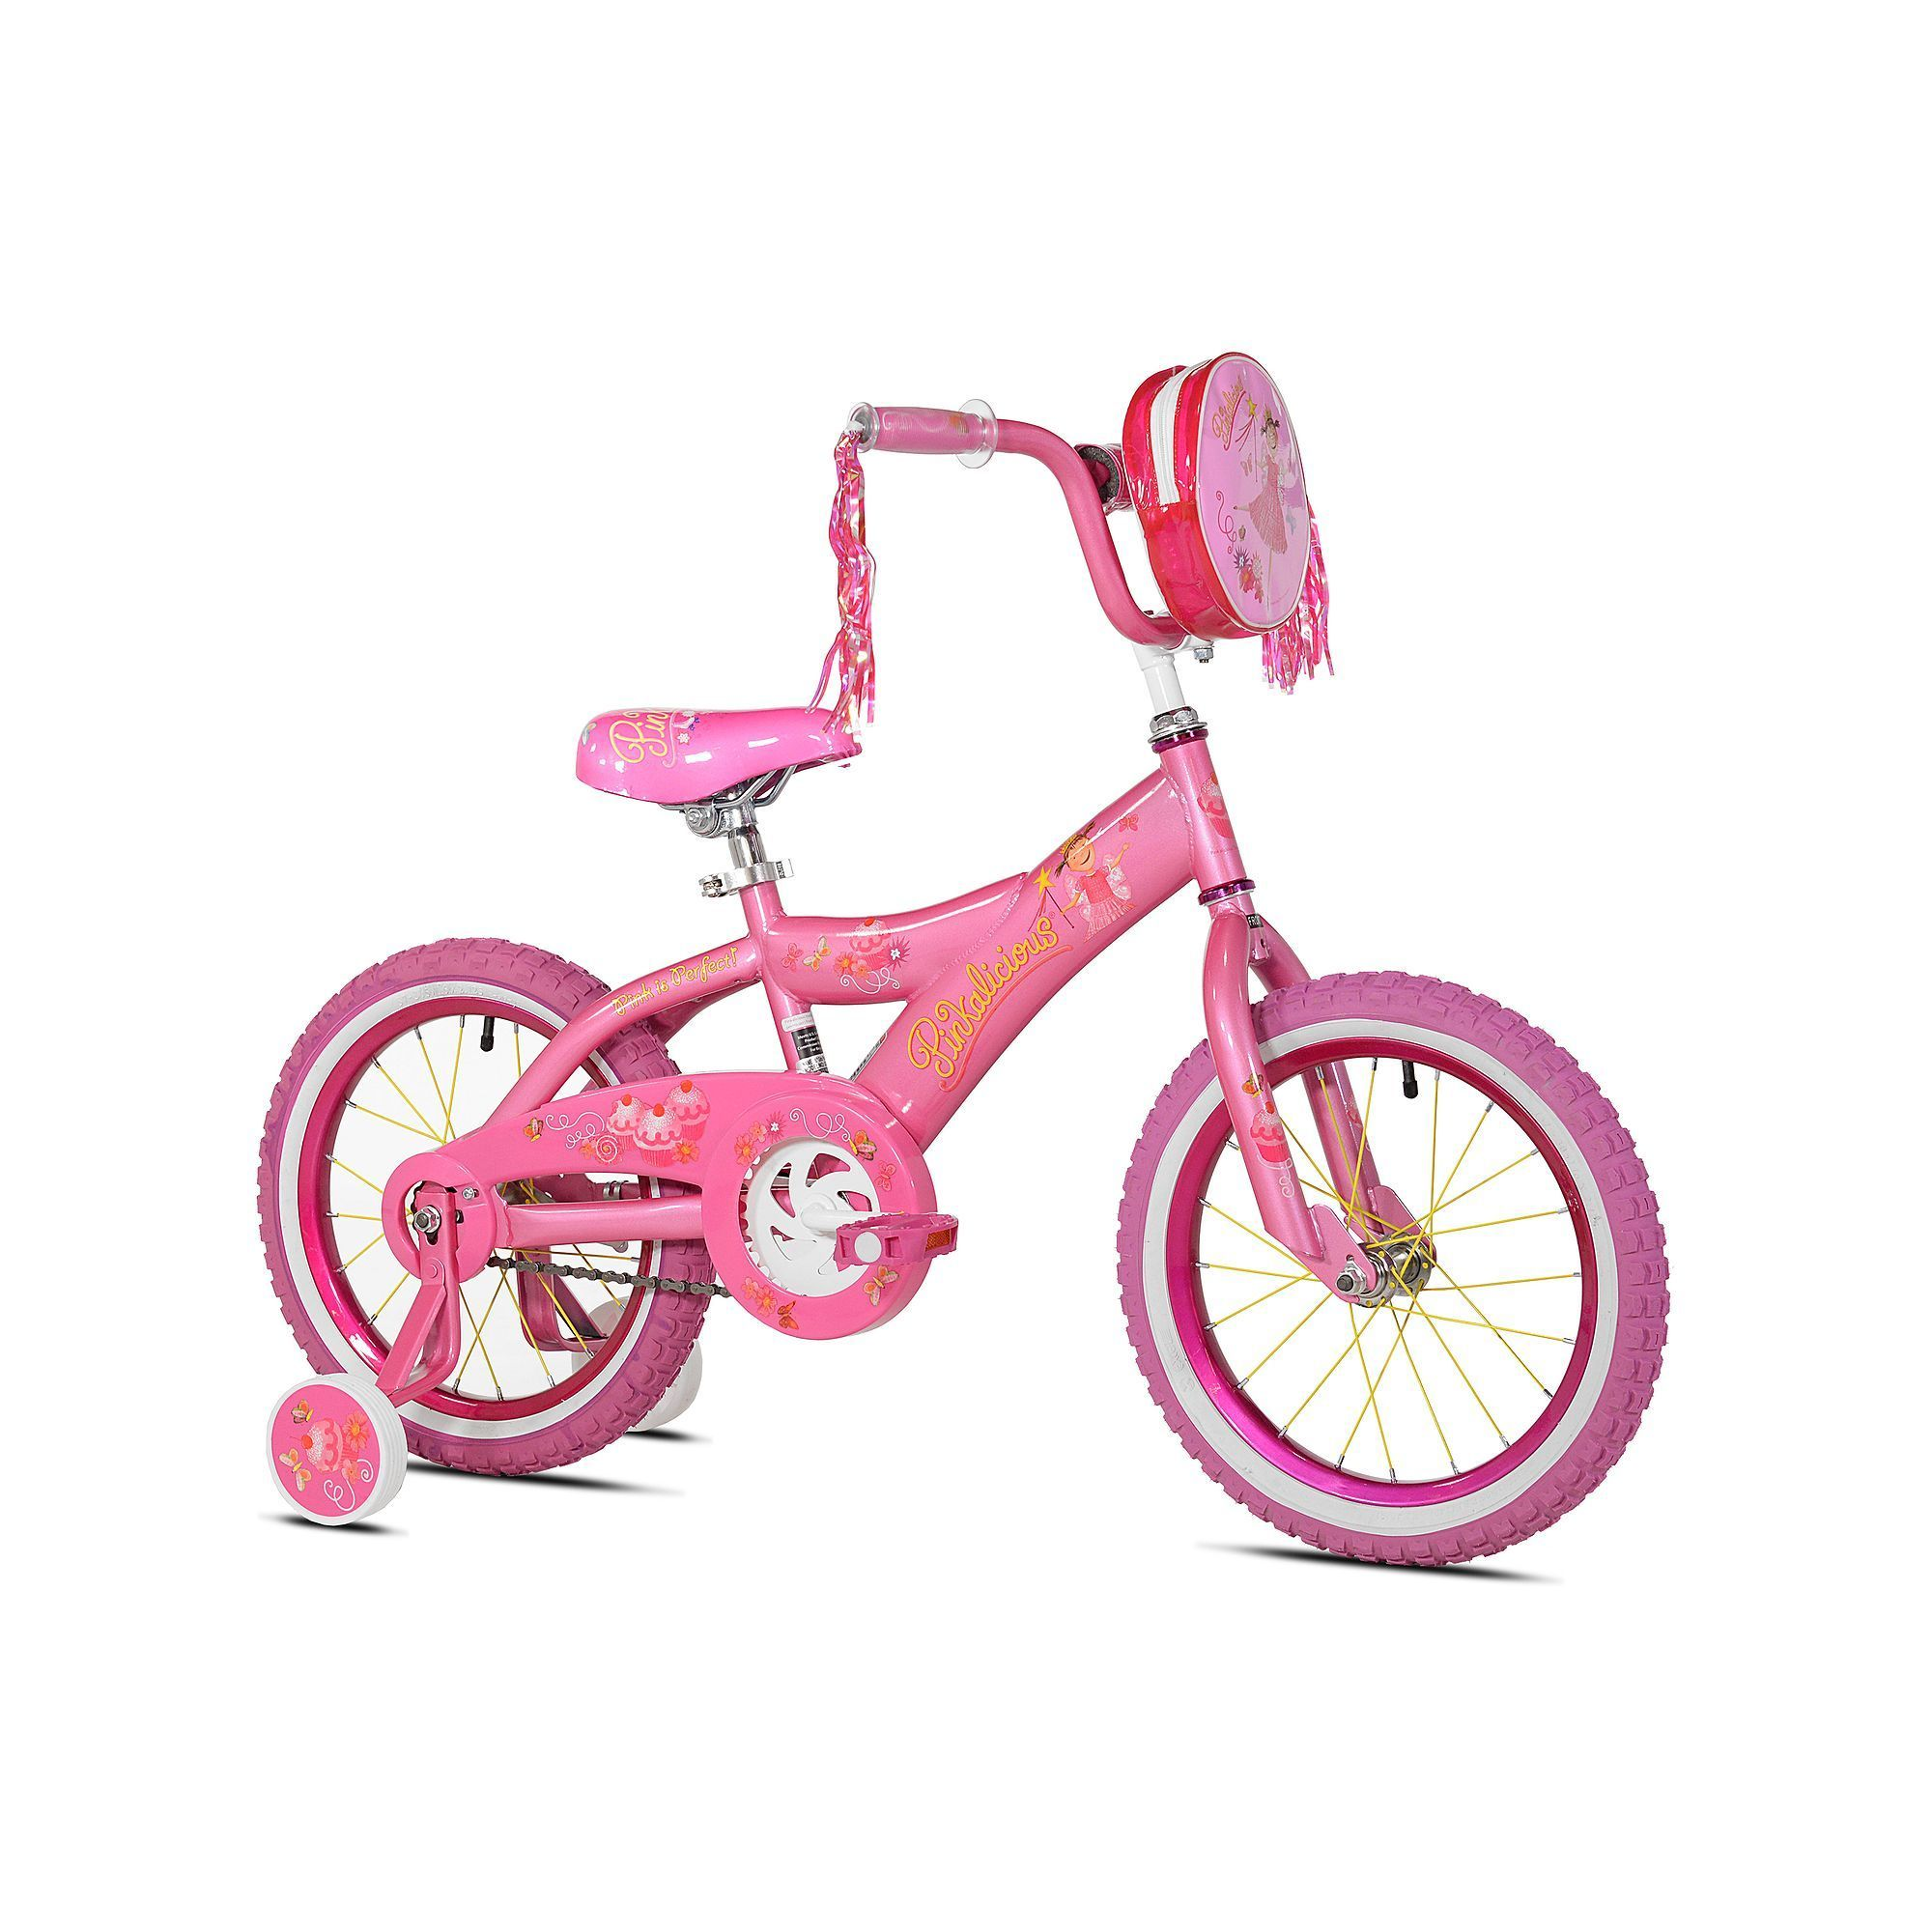 Girls Kent 16 Inch Pinkalicious Bike With Training Wheels Bike With Training Wheels Bikes Girls Childrens Bike